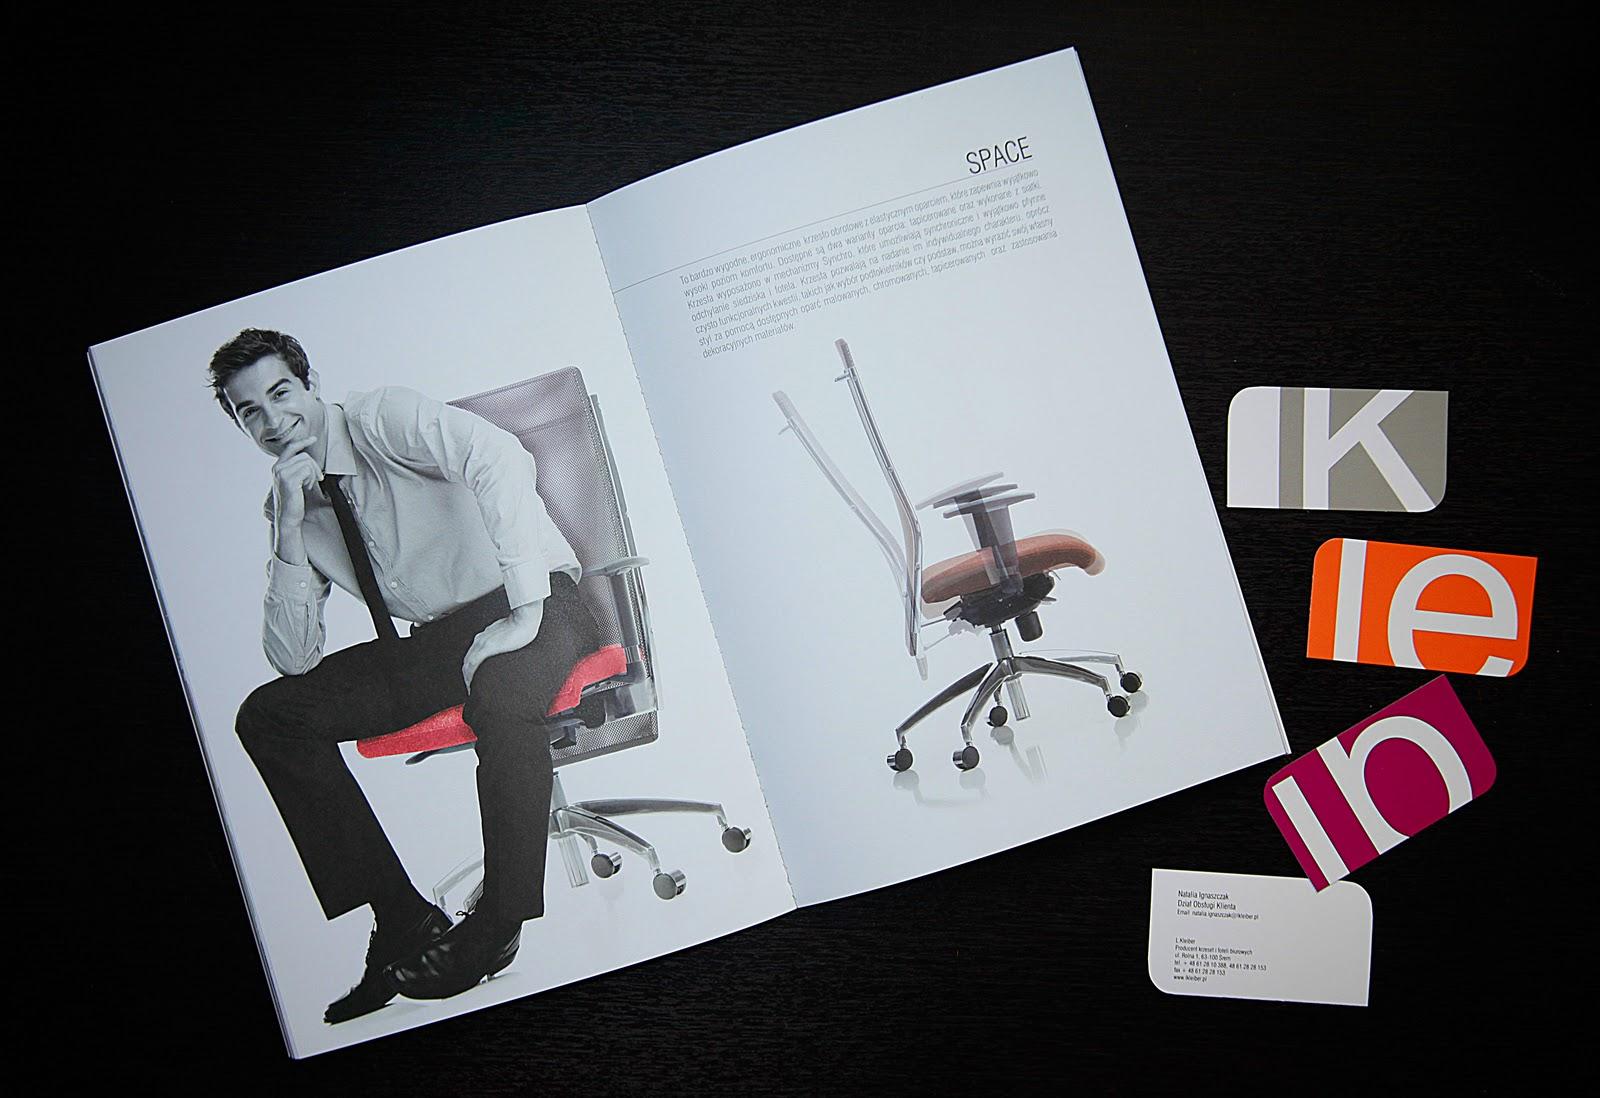 LKleiber katalog 2012 01